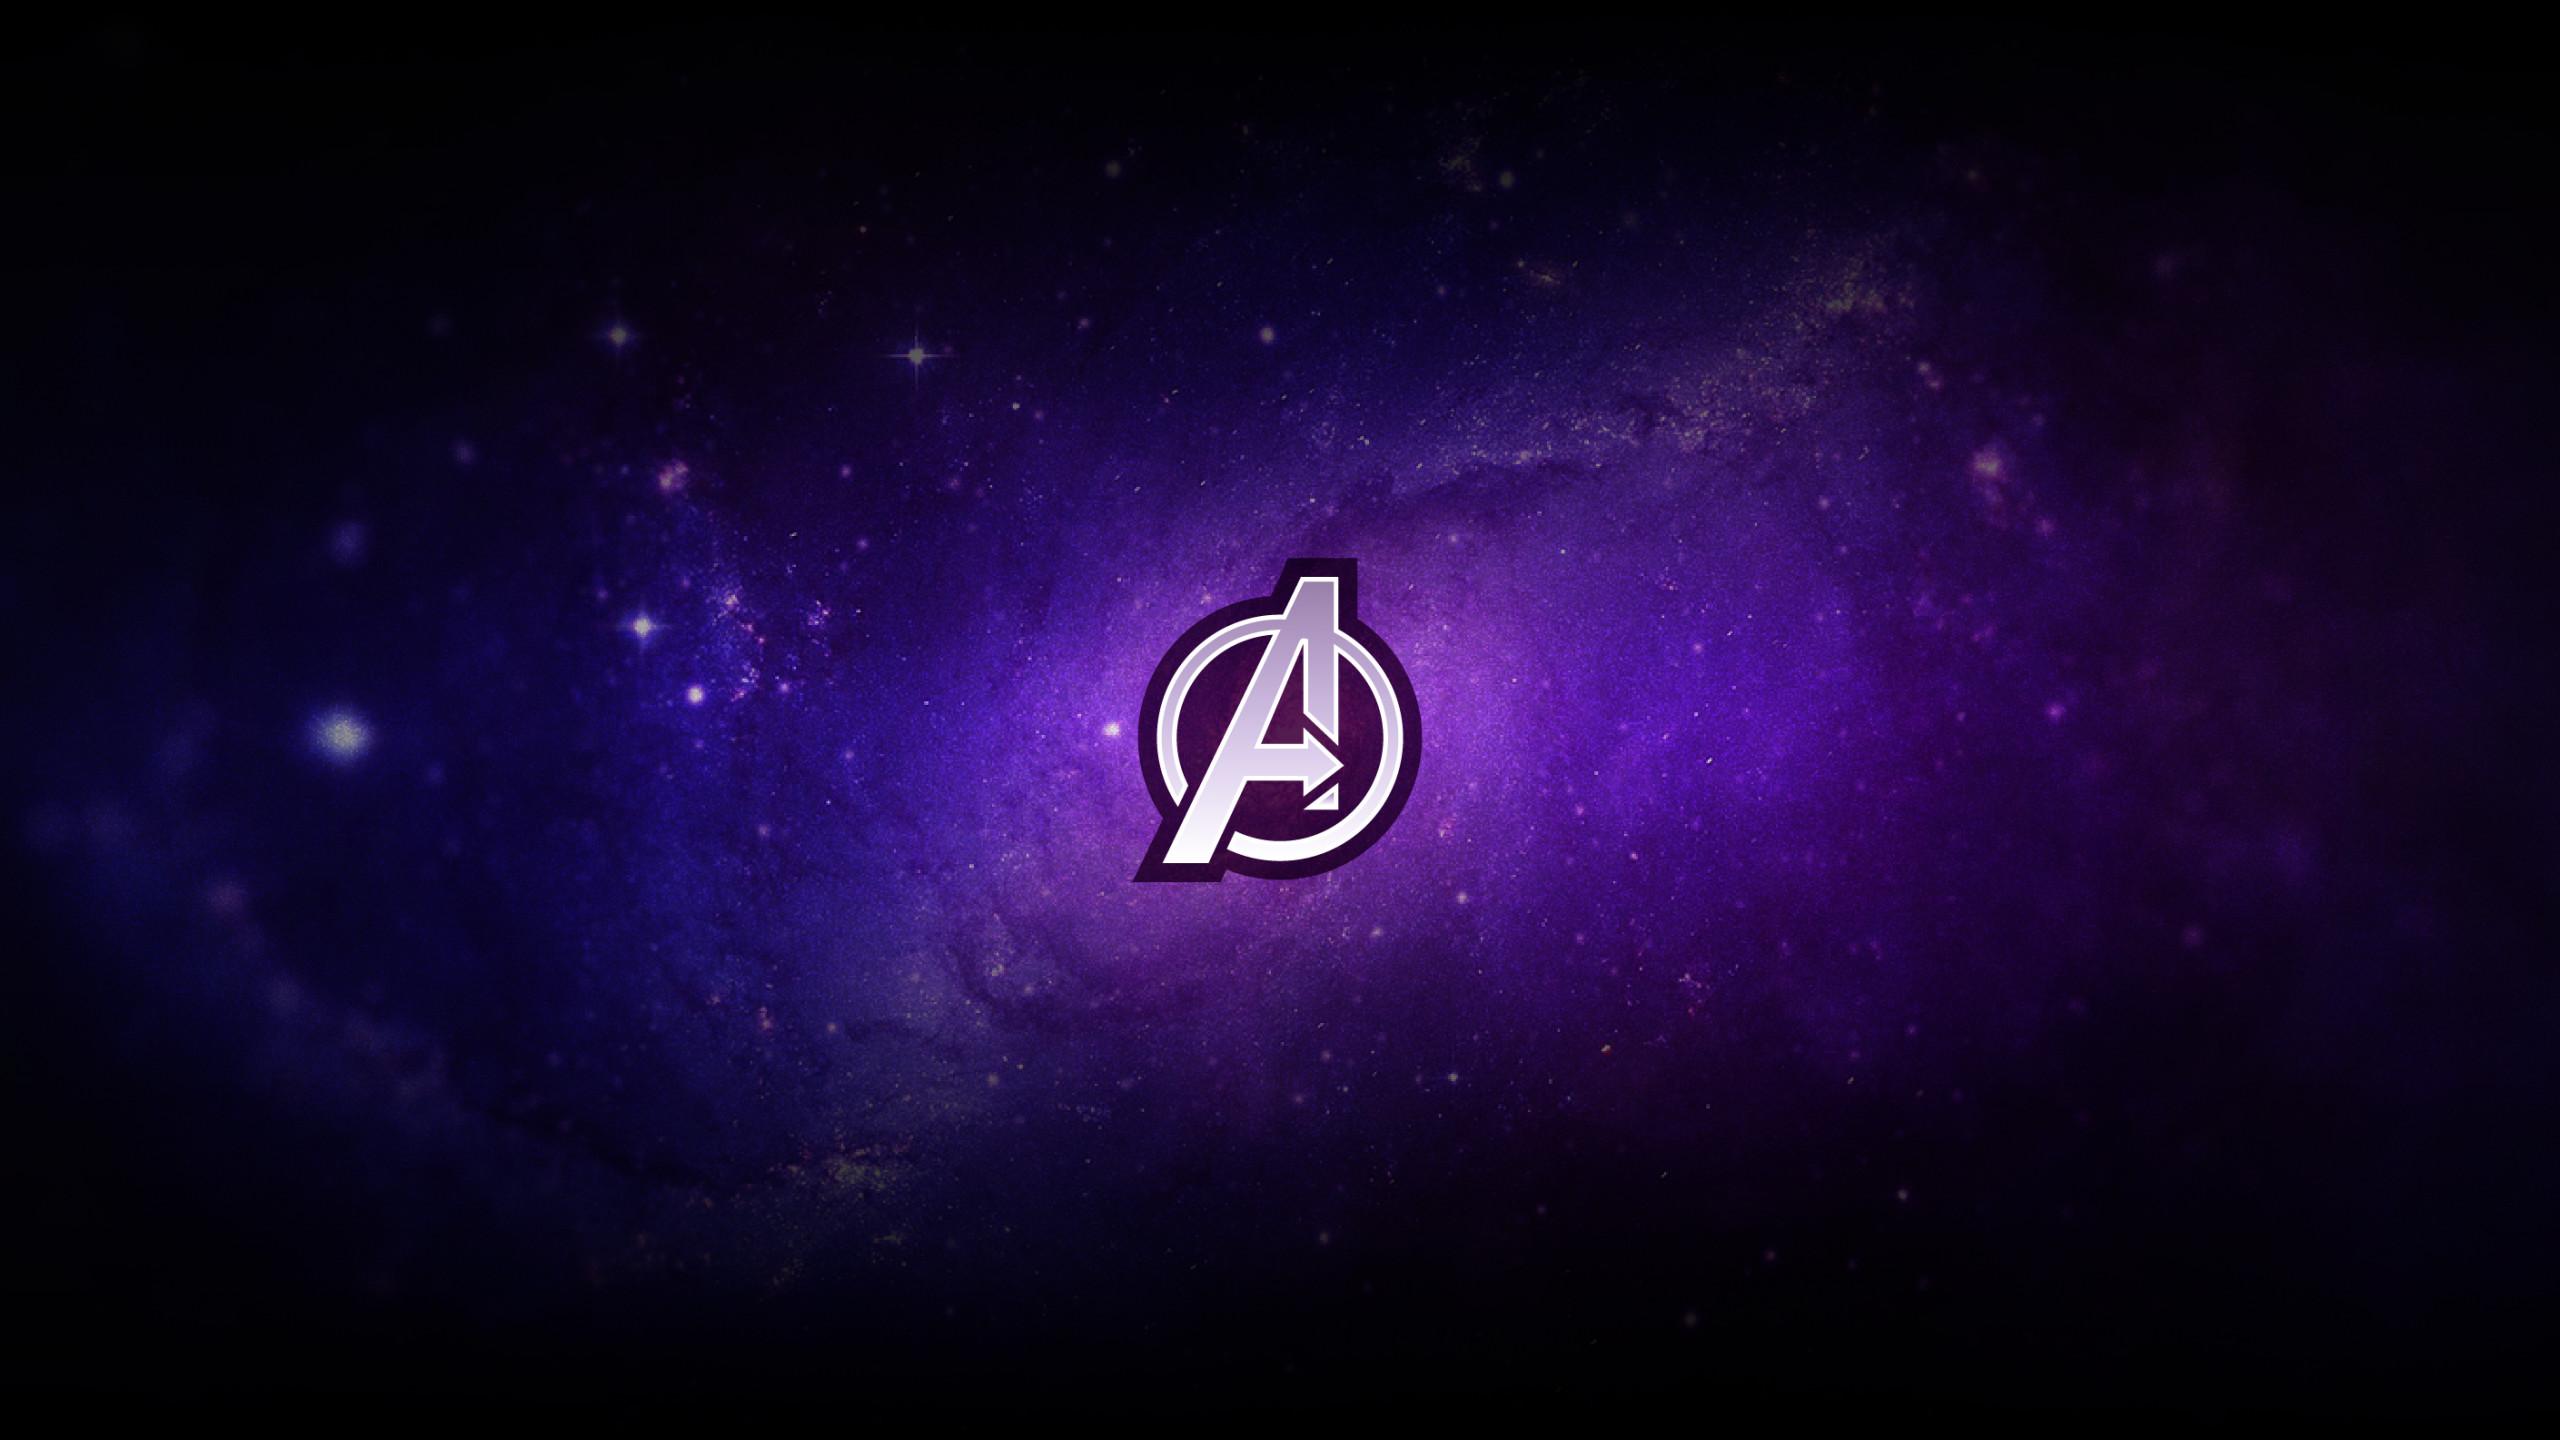 Res: 2560x1440, Avengers, logo, purple, minimal,  wallpaper